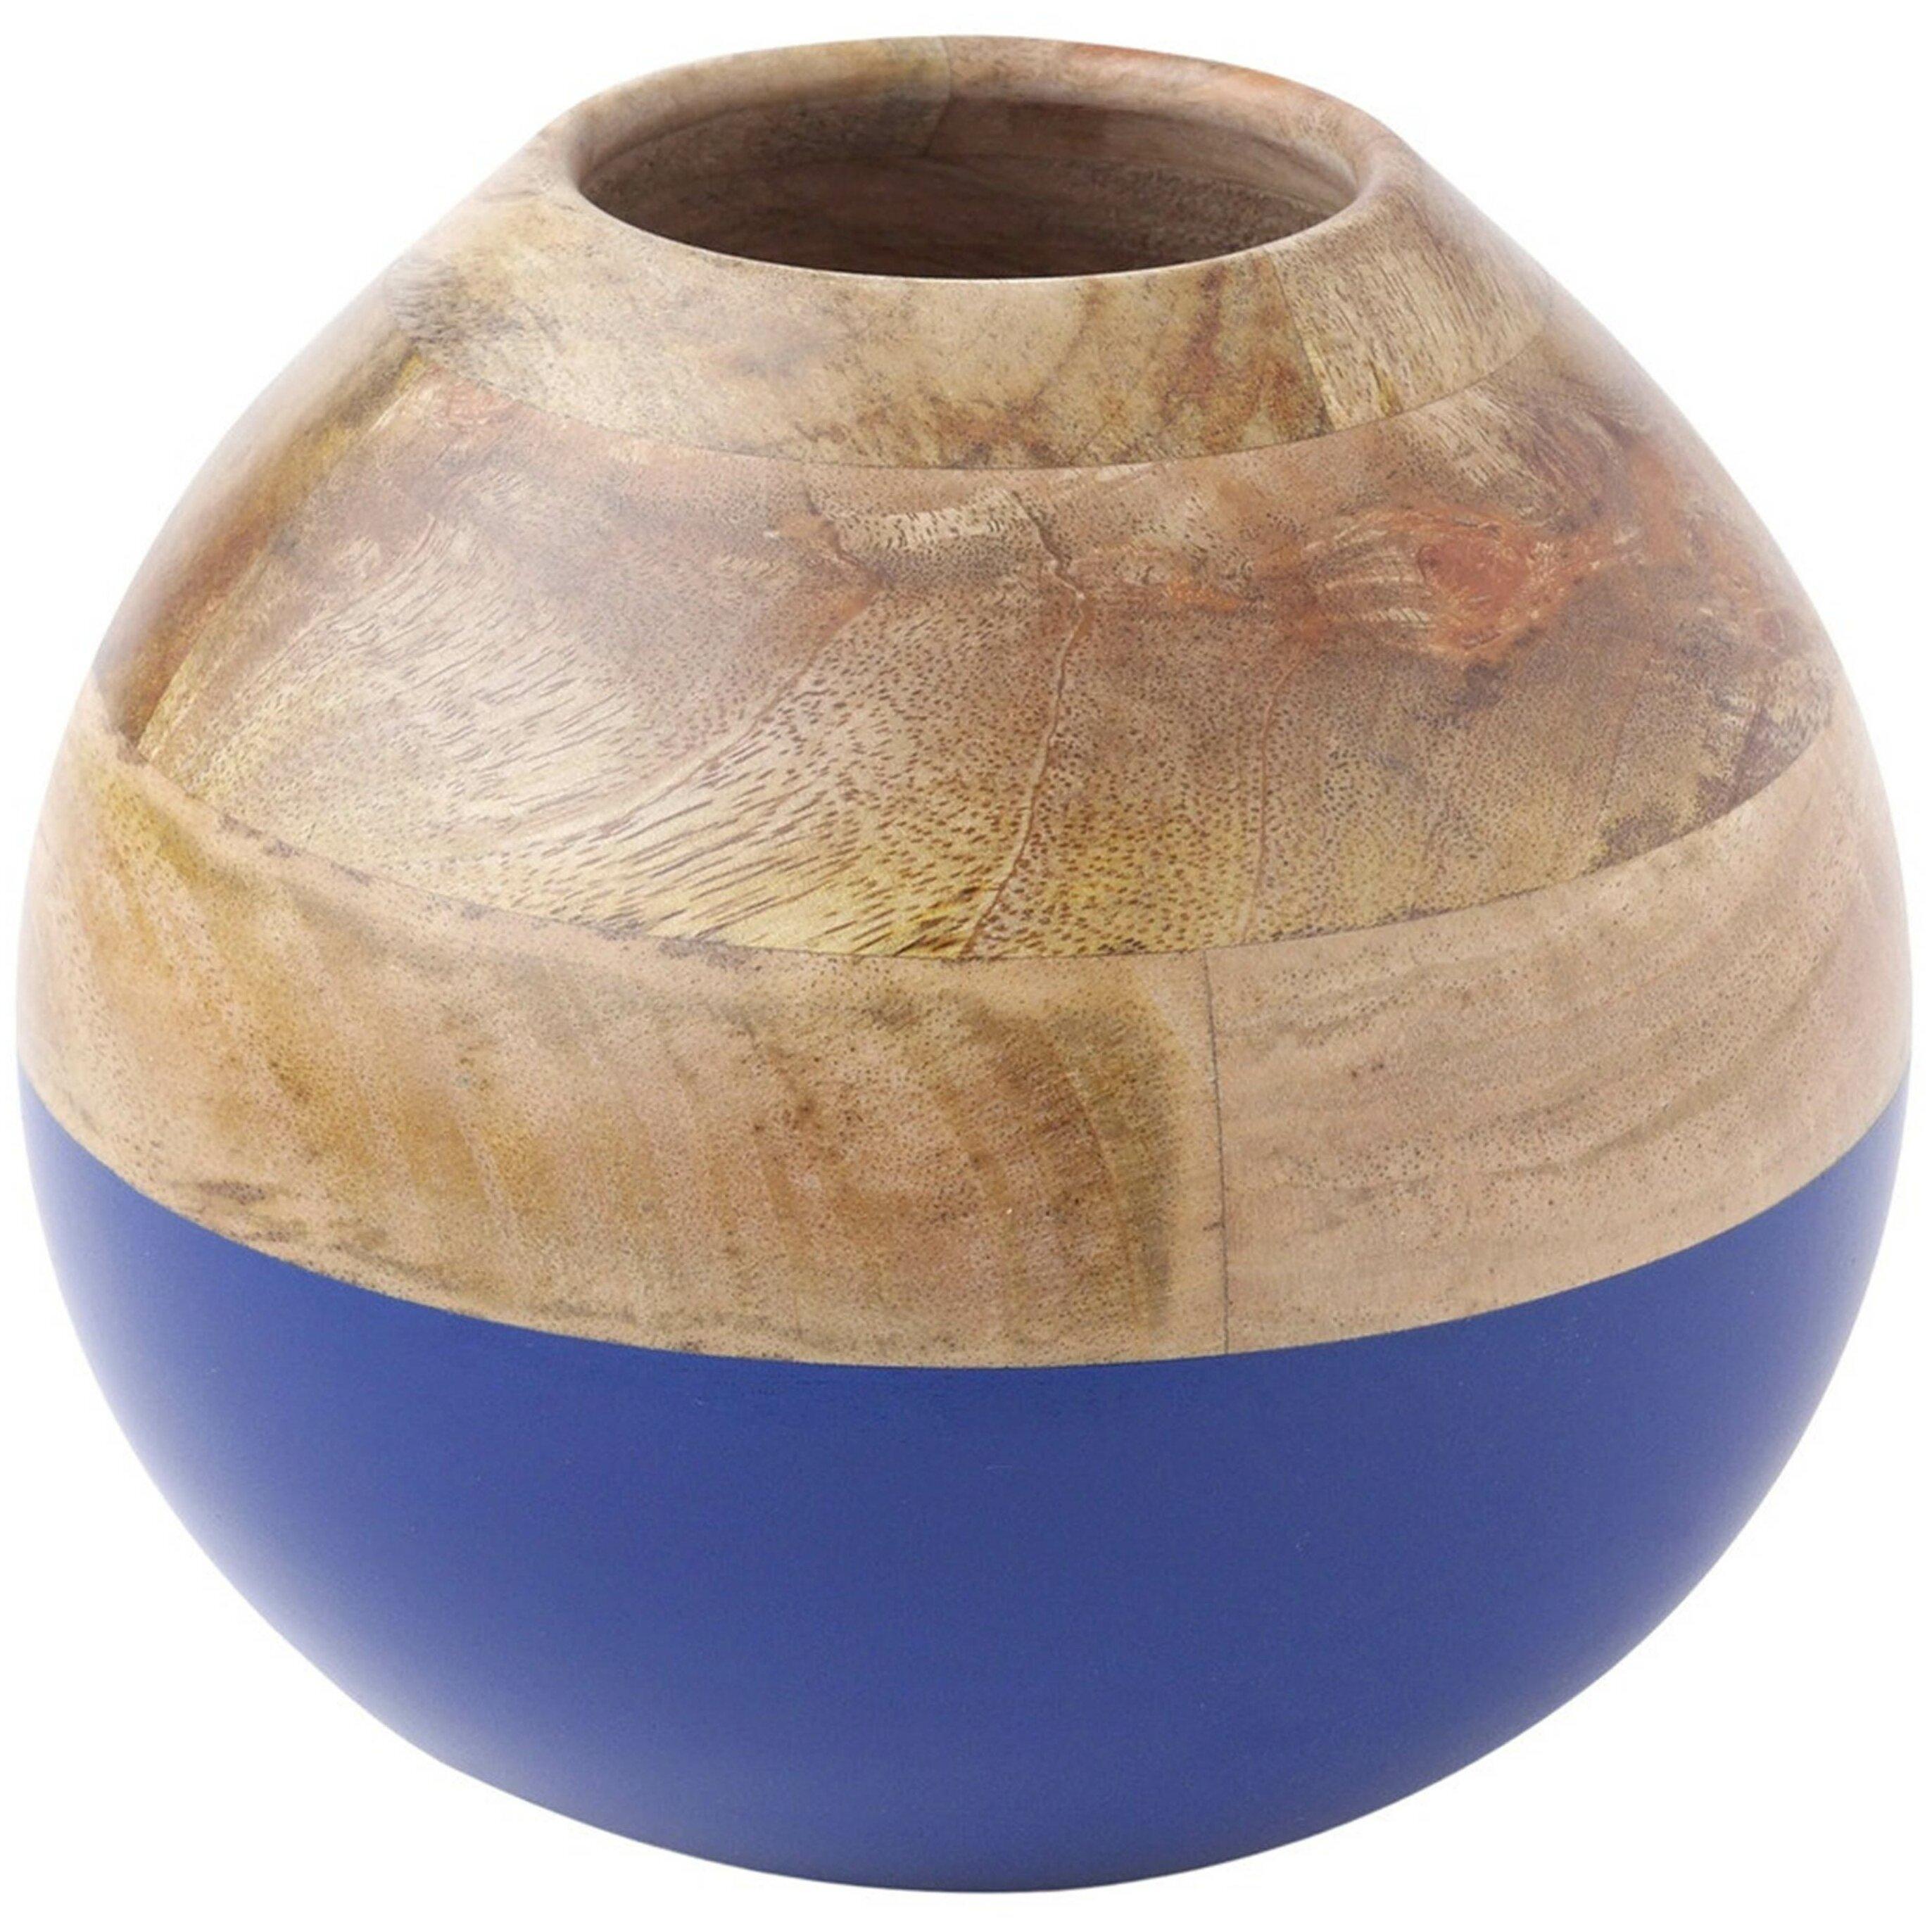 Decorative Bowls Hallmark Home Gifts Mango Wood Decorative Bowl Reviews Wayfair